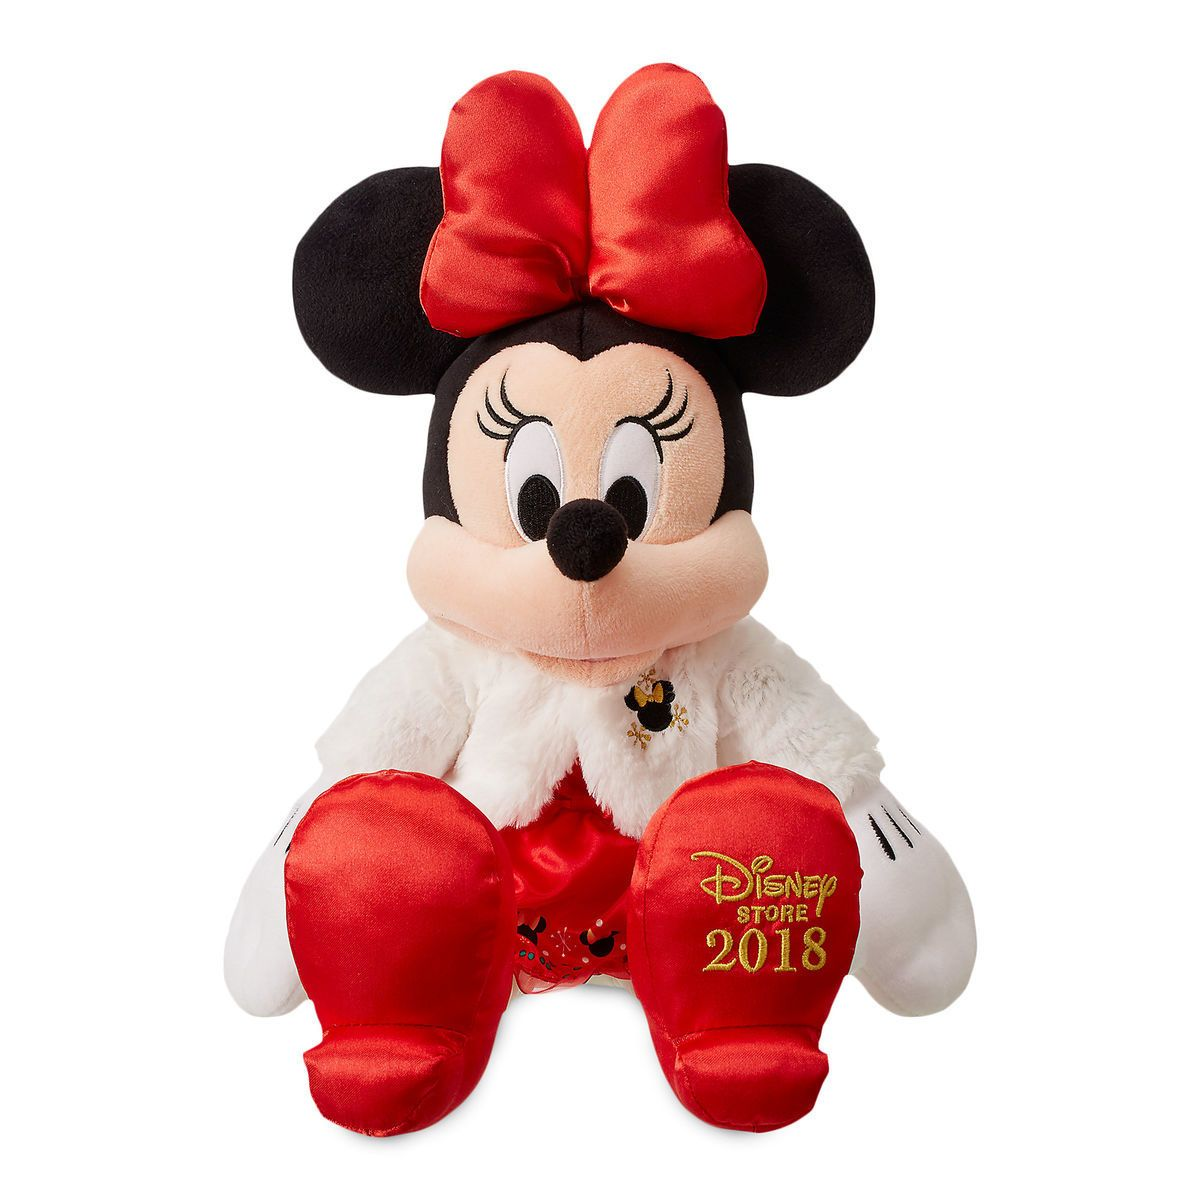 Christmas Minnie Mouse Plush.Minnie Mouse Holiday Plush Medium Christmas Town